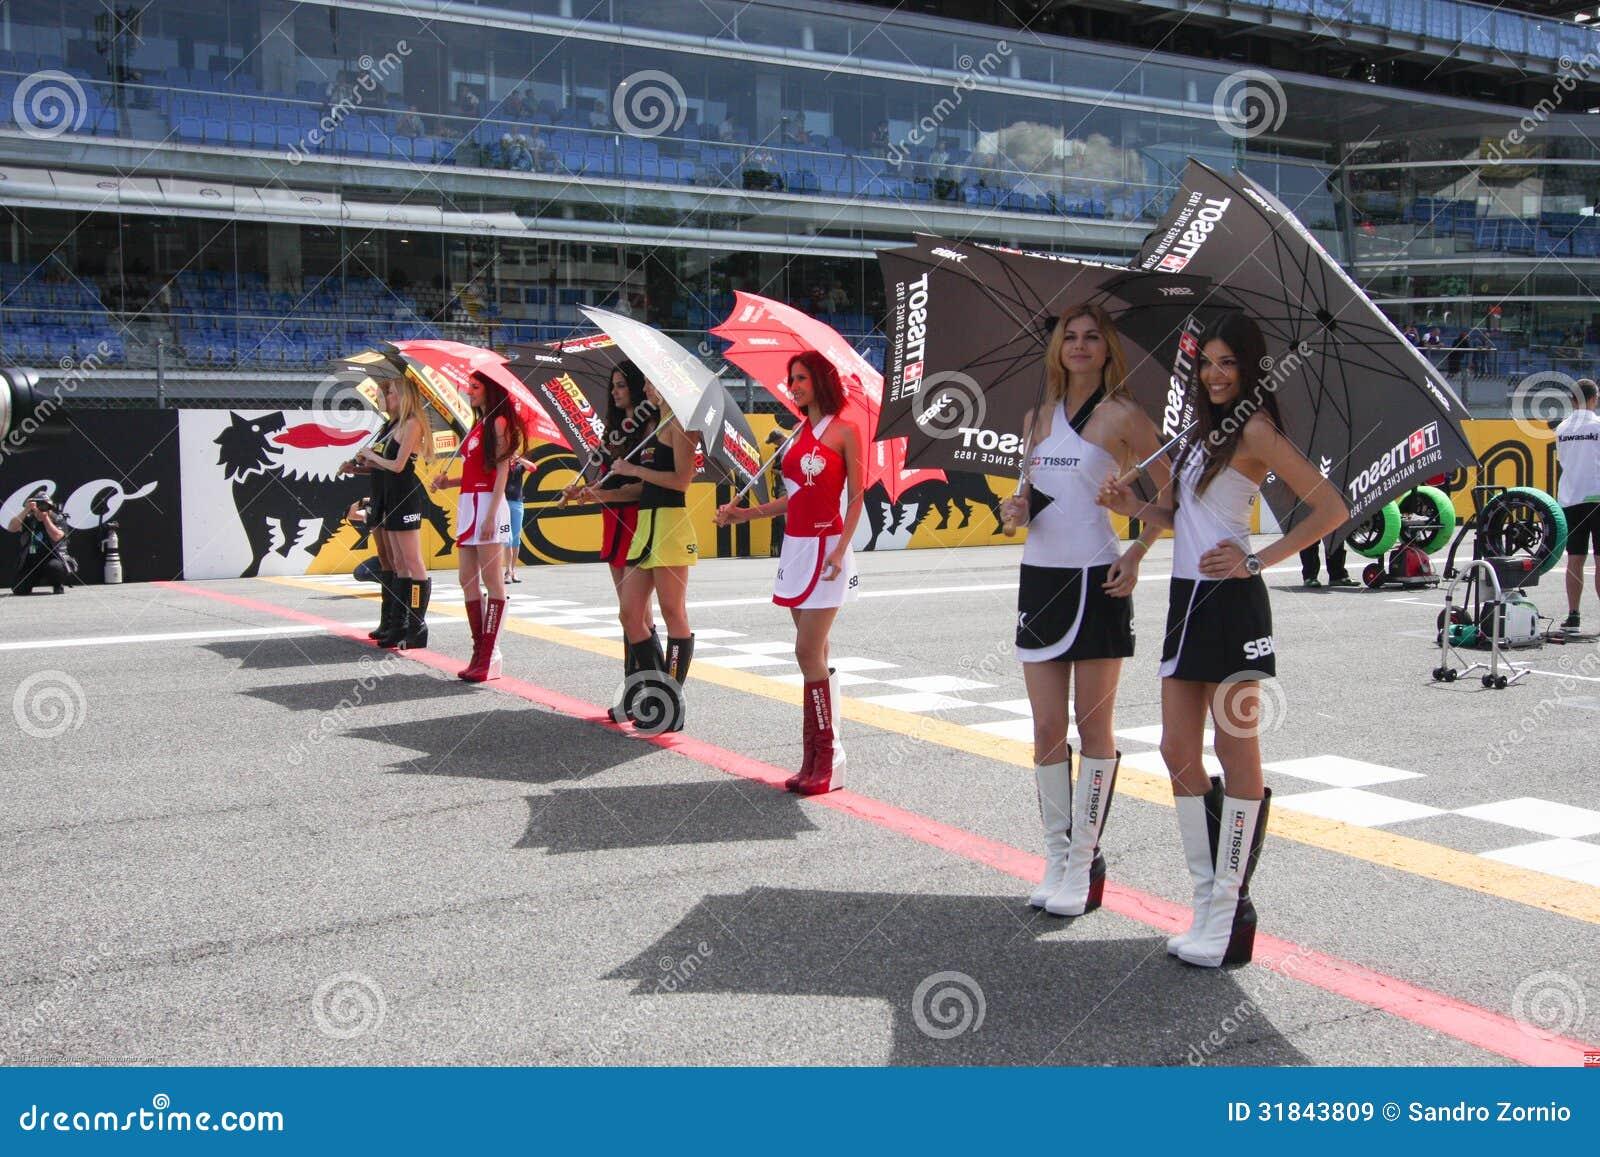 Umbrella Girl at Monza 2013 WSBK